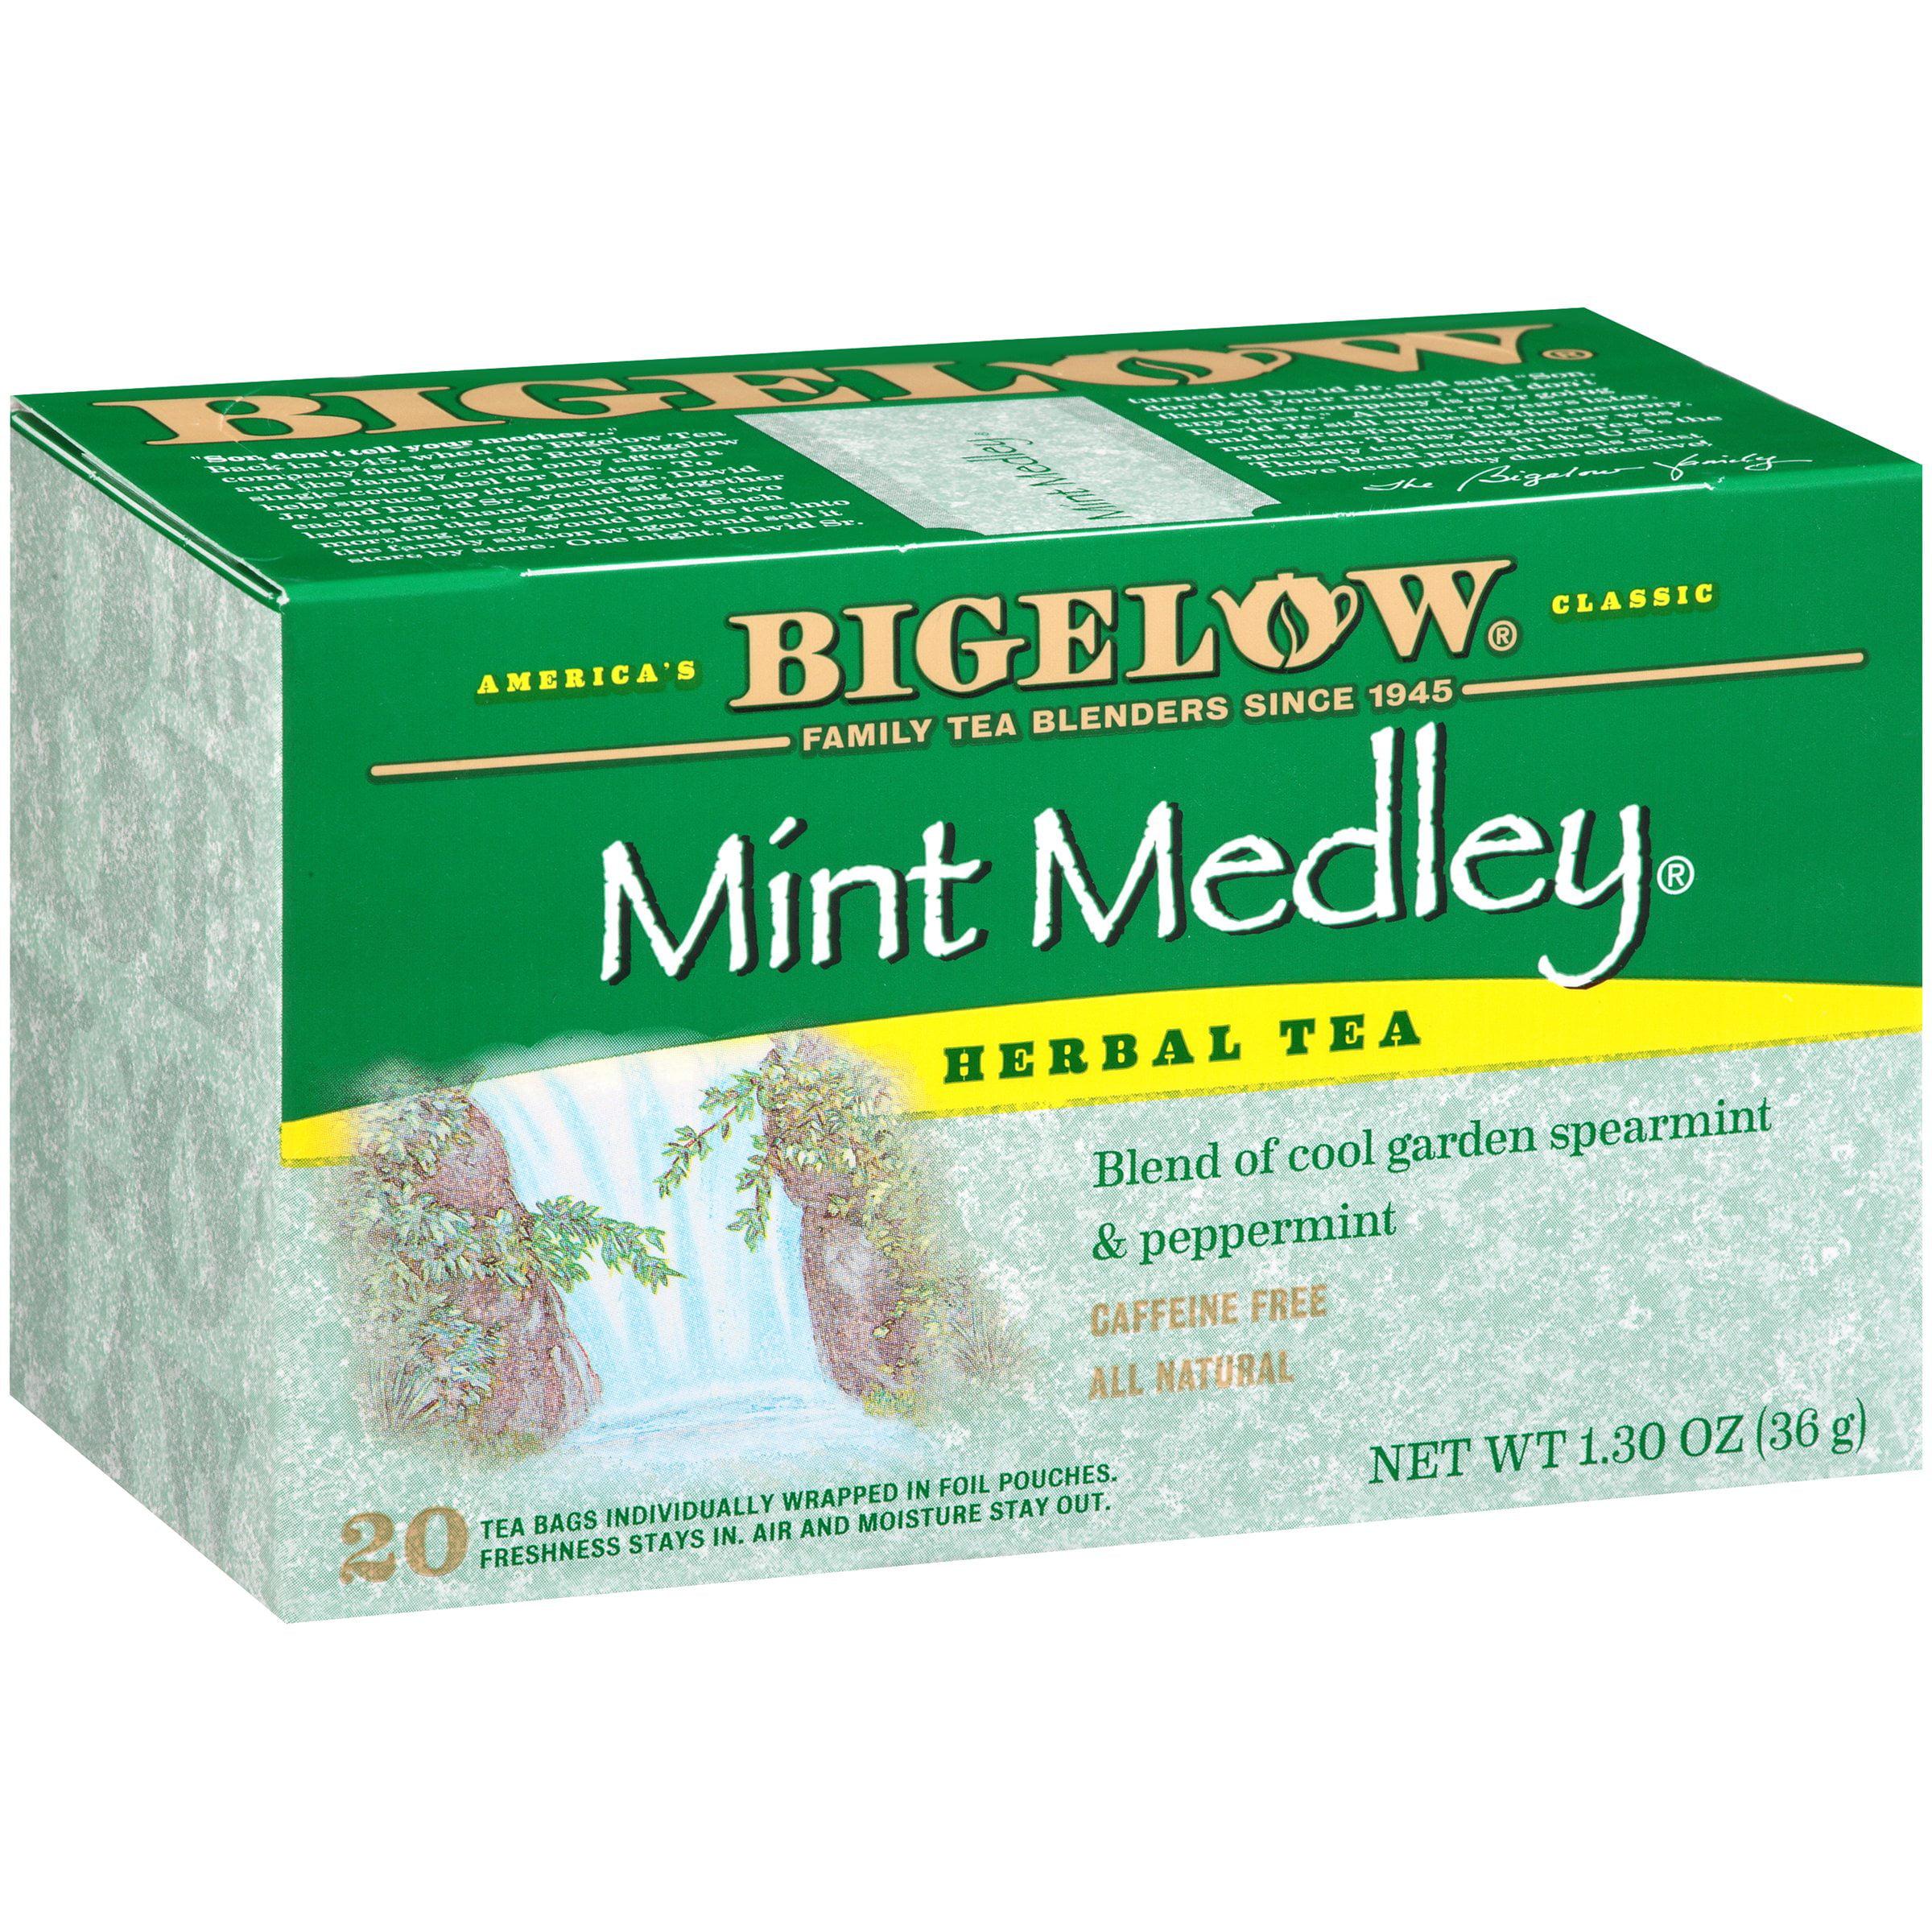 Bigelow Mint Medley Herbal Tea 1.30 oz. Box by RC Bigelow, Inc.